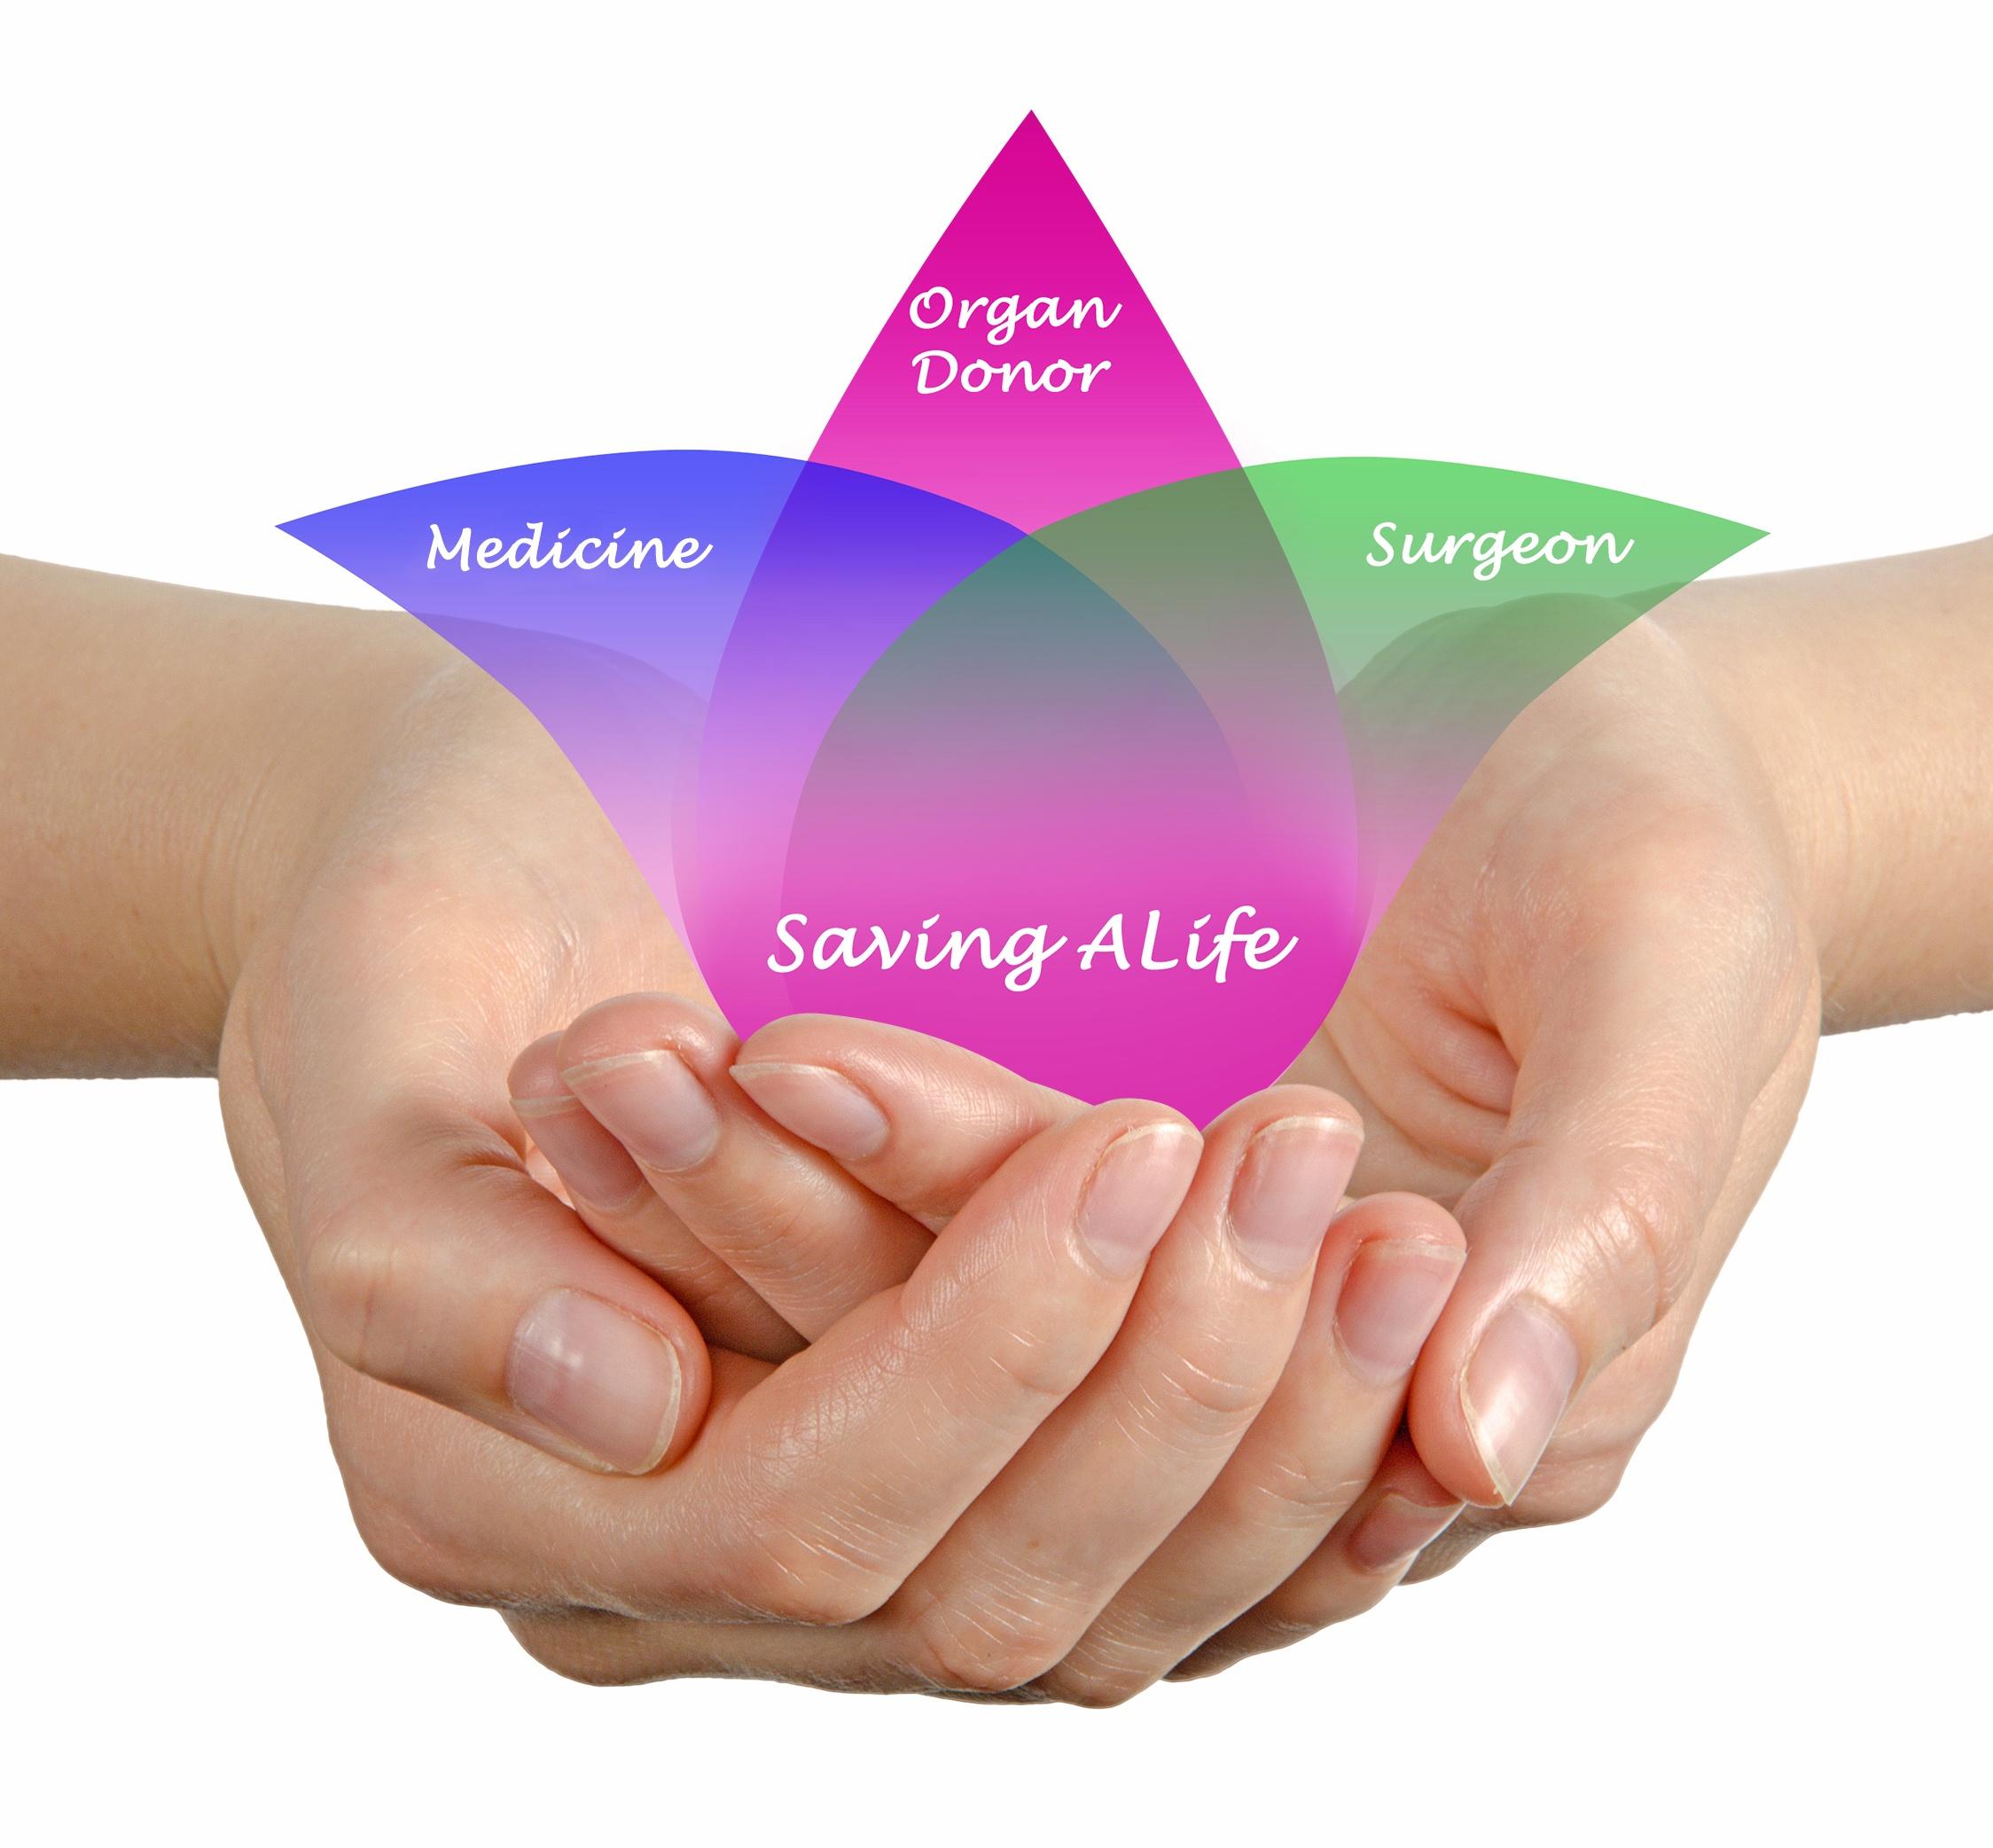 donate_life_organ_donor_transplant_graphic.jpg